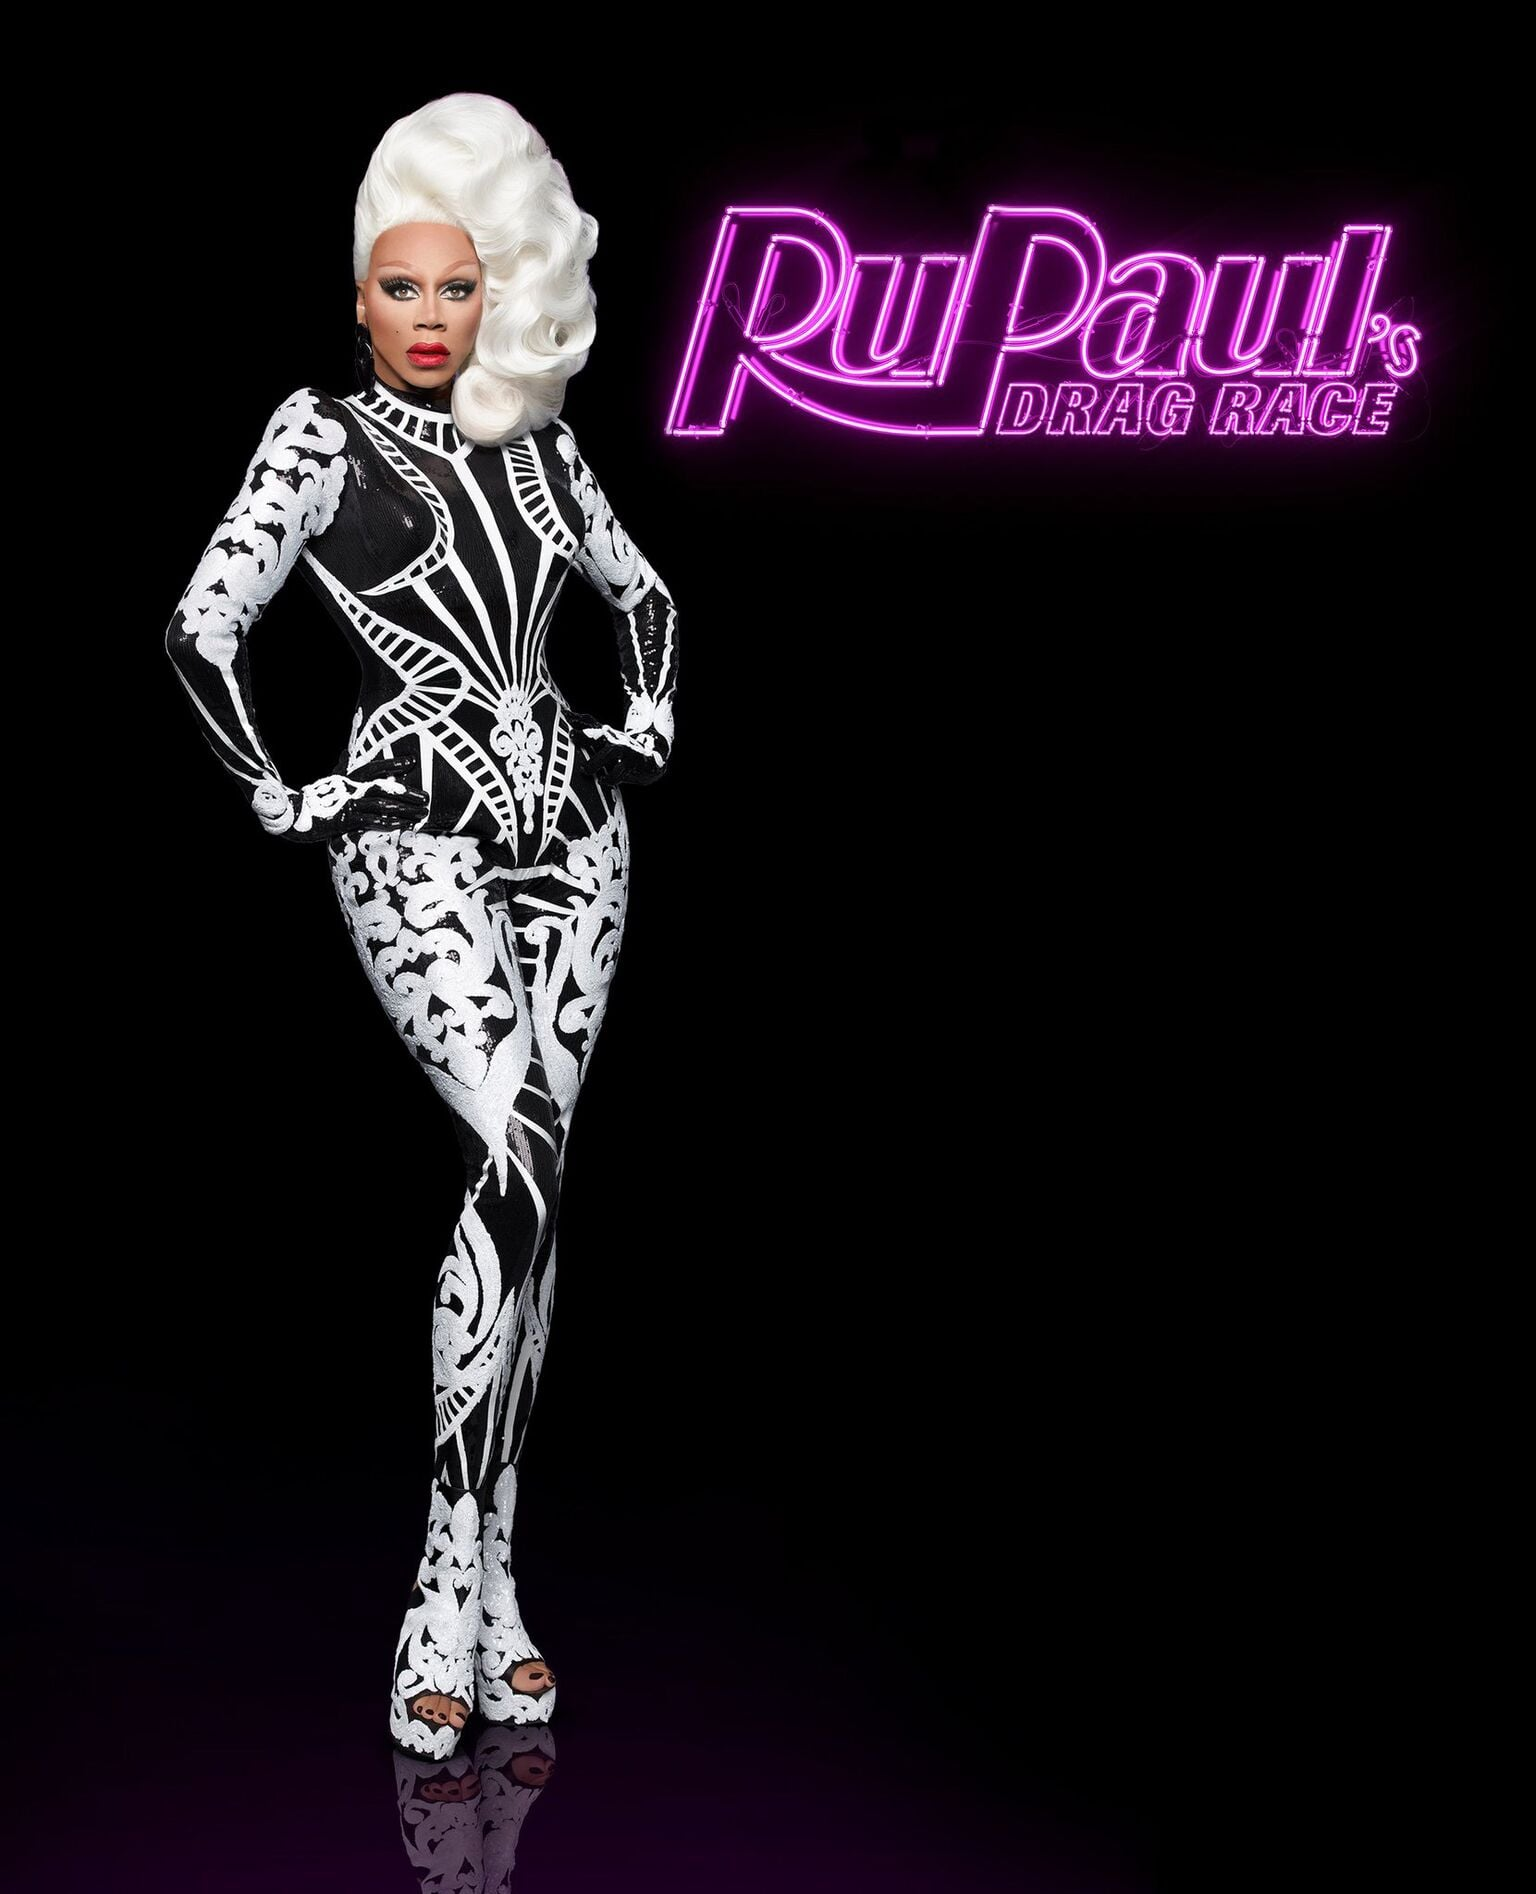 Rupauls Christmas Special.Rupaul S Drag Race Holiday Episode Popsugar Celebrity